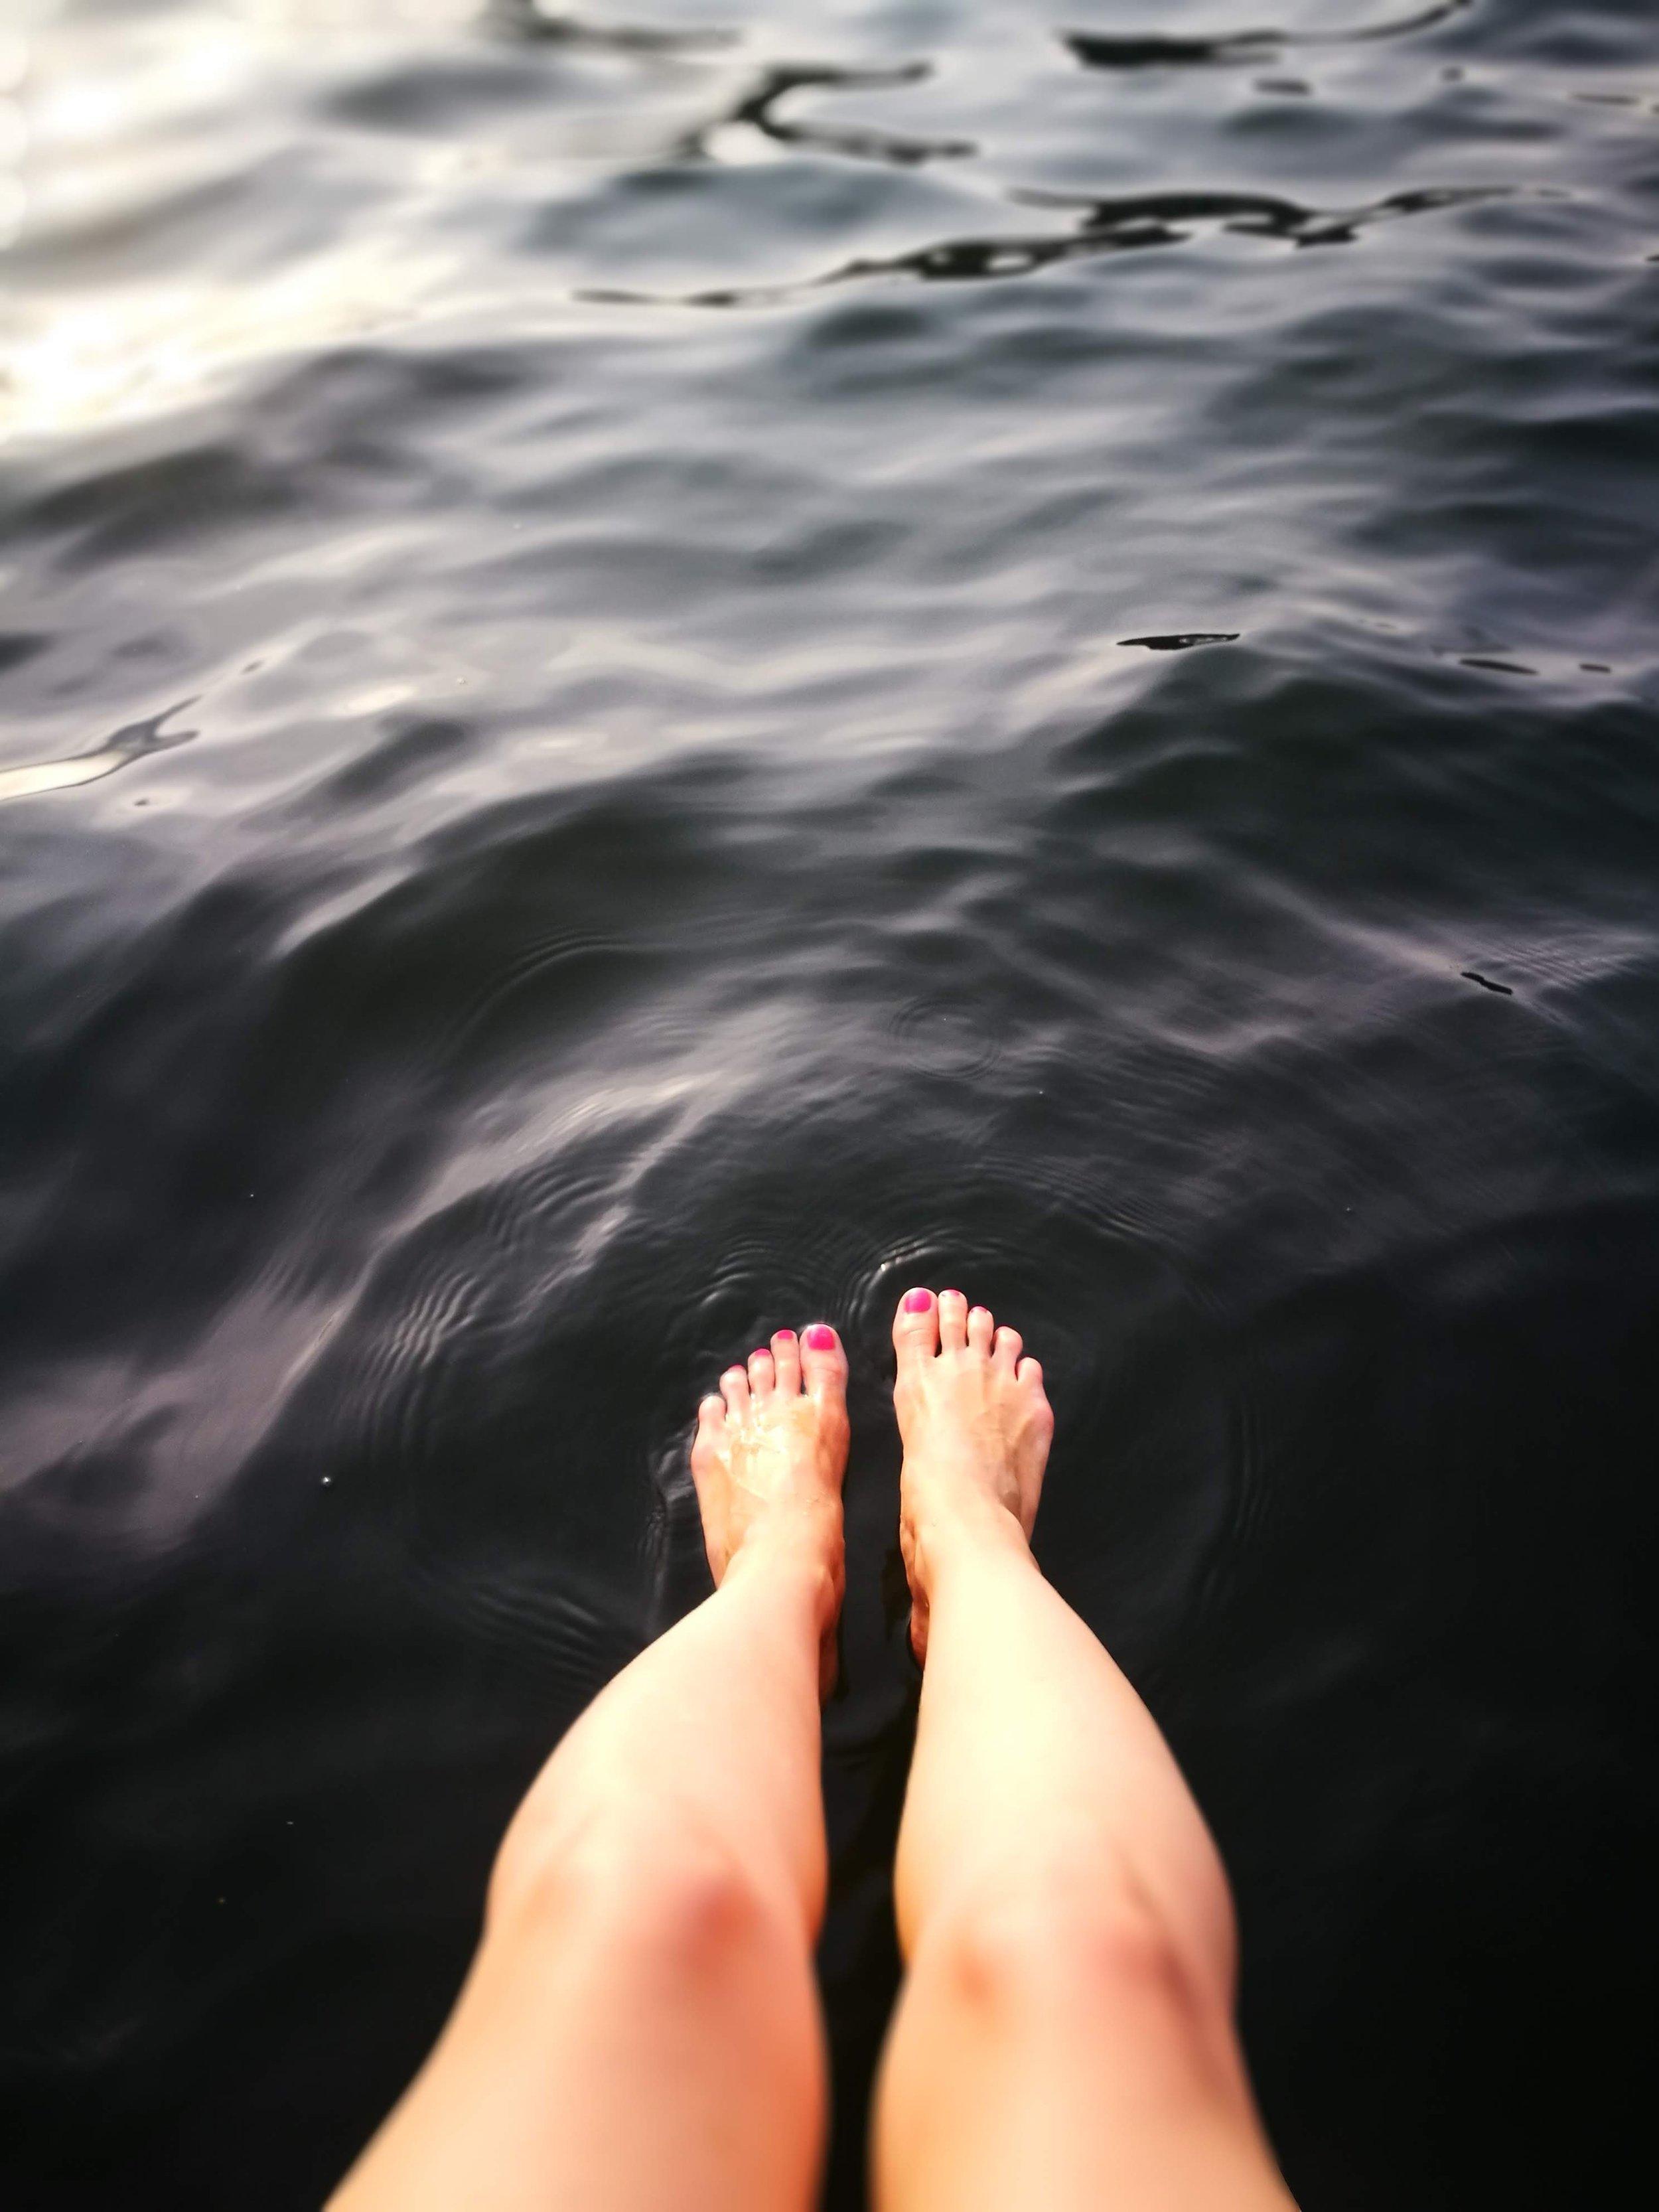 liliya-dyulgerov-799724-unsplash legs in water.jpg